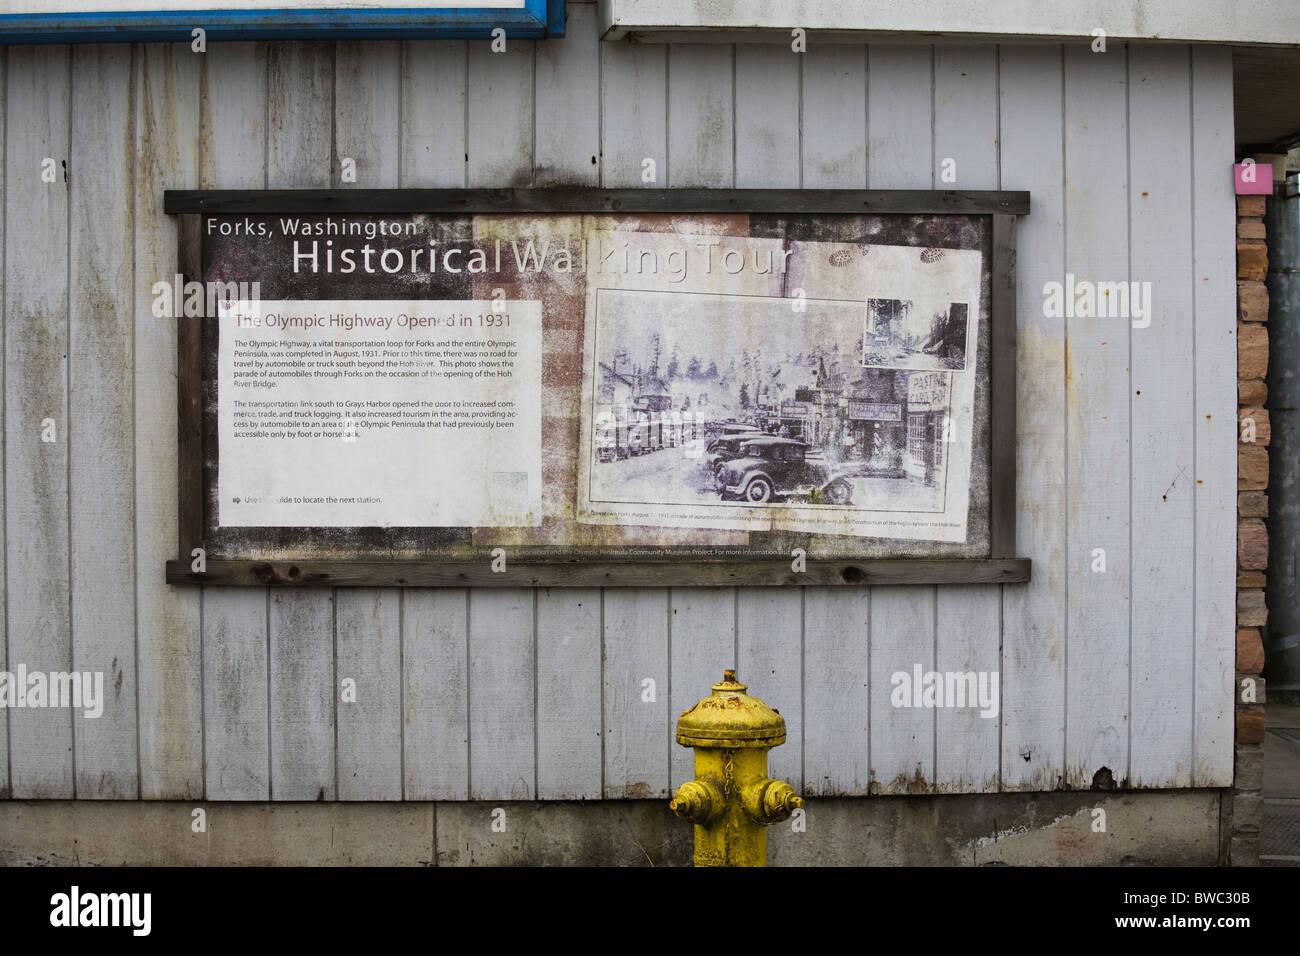 Historical photograph, Forks, Washington State, USA - Stock Image